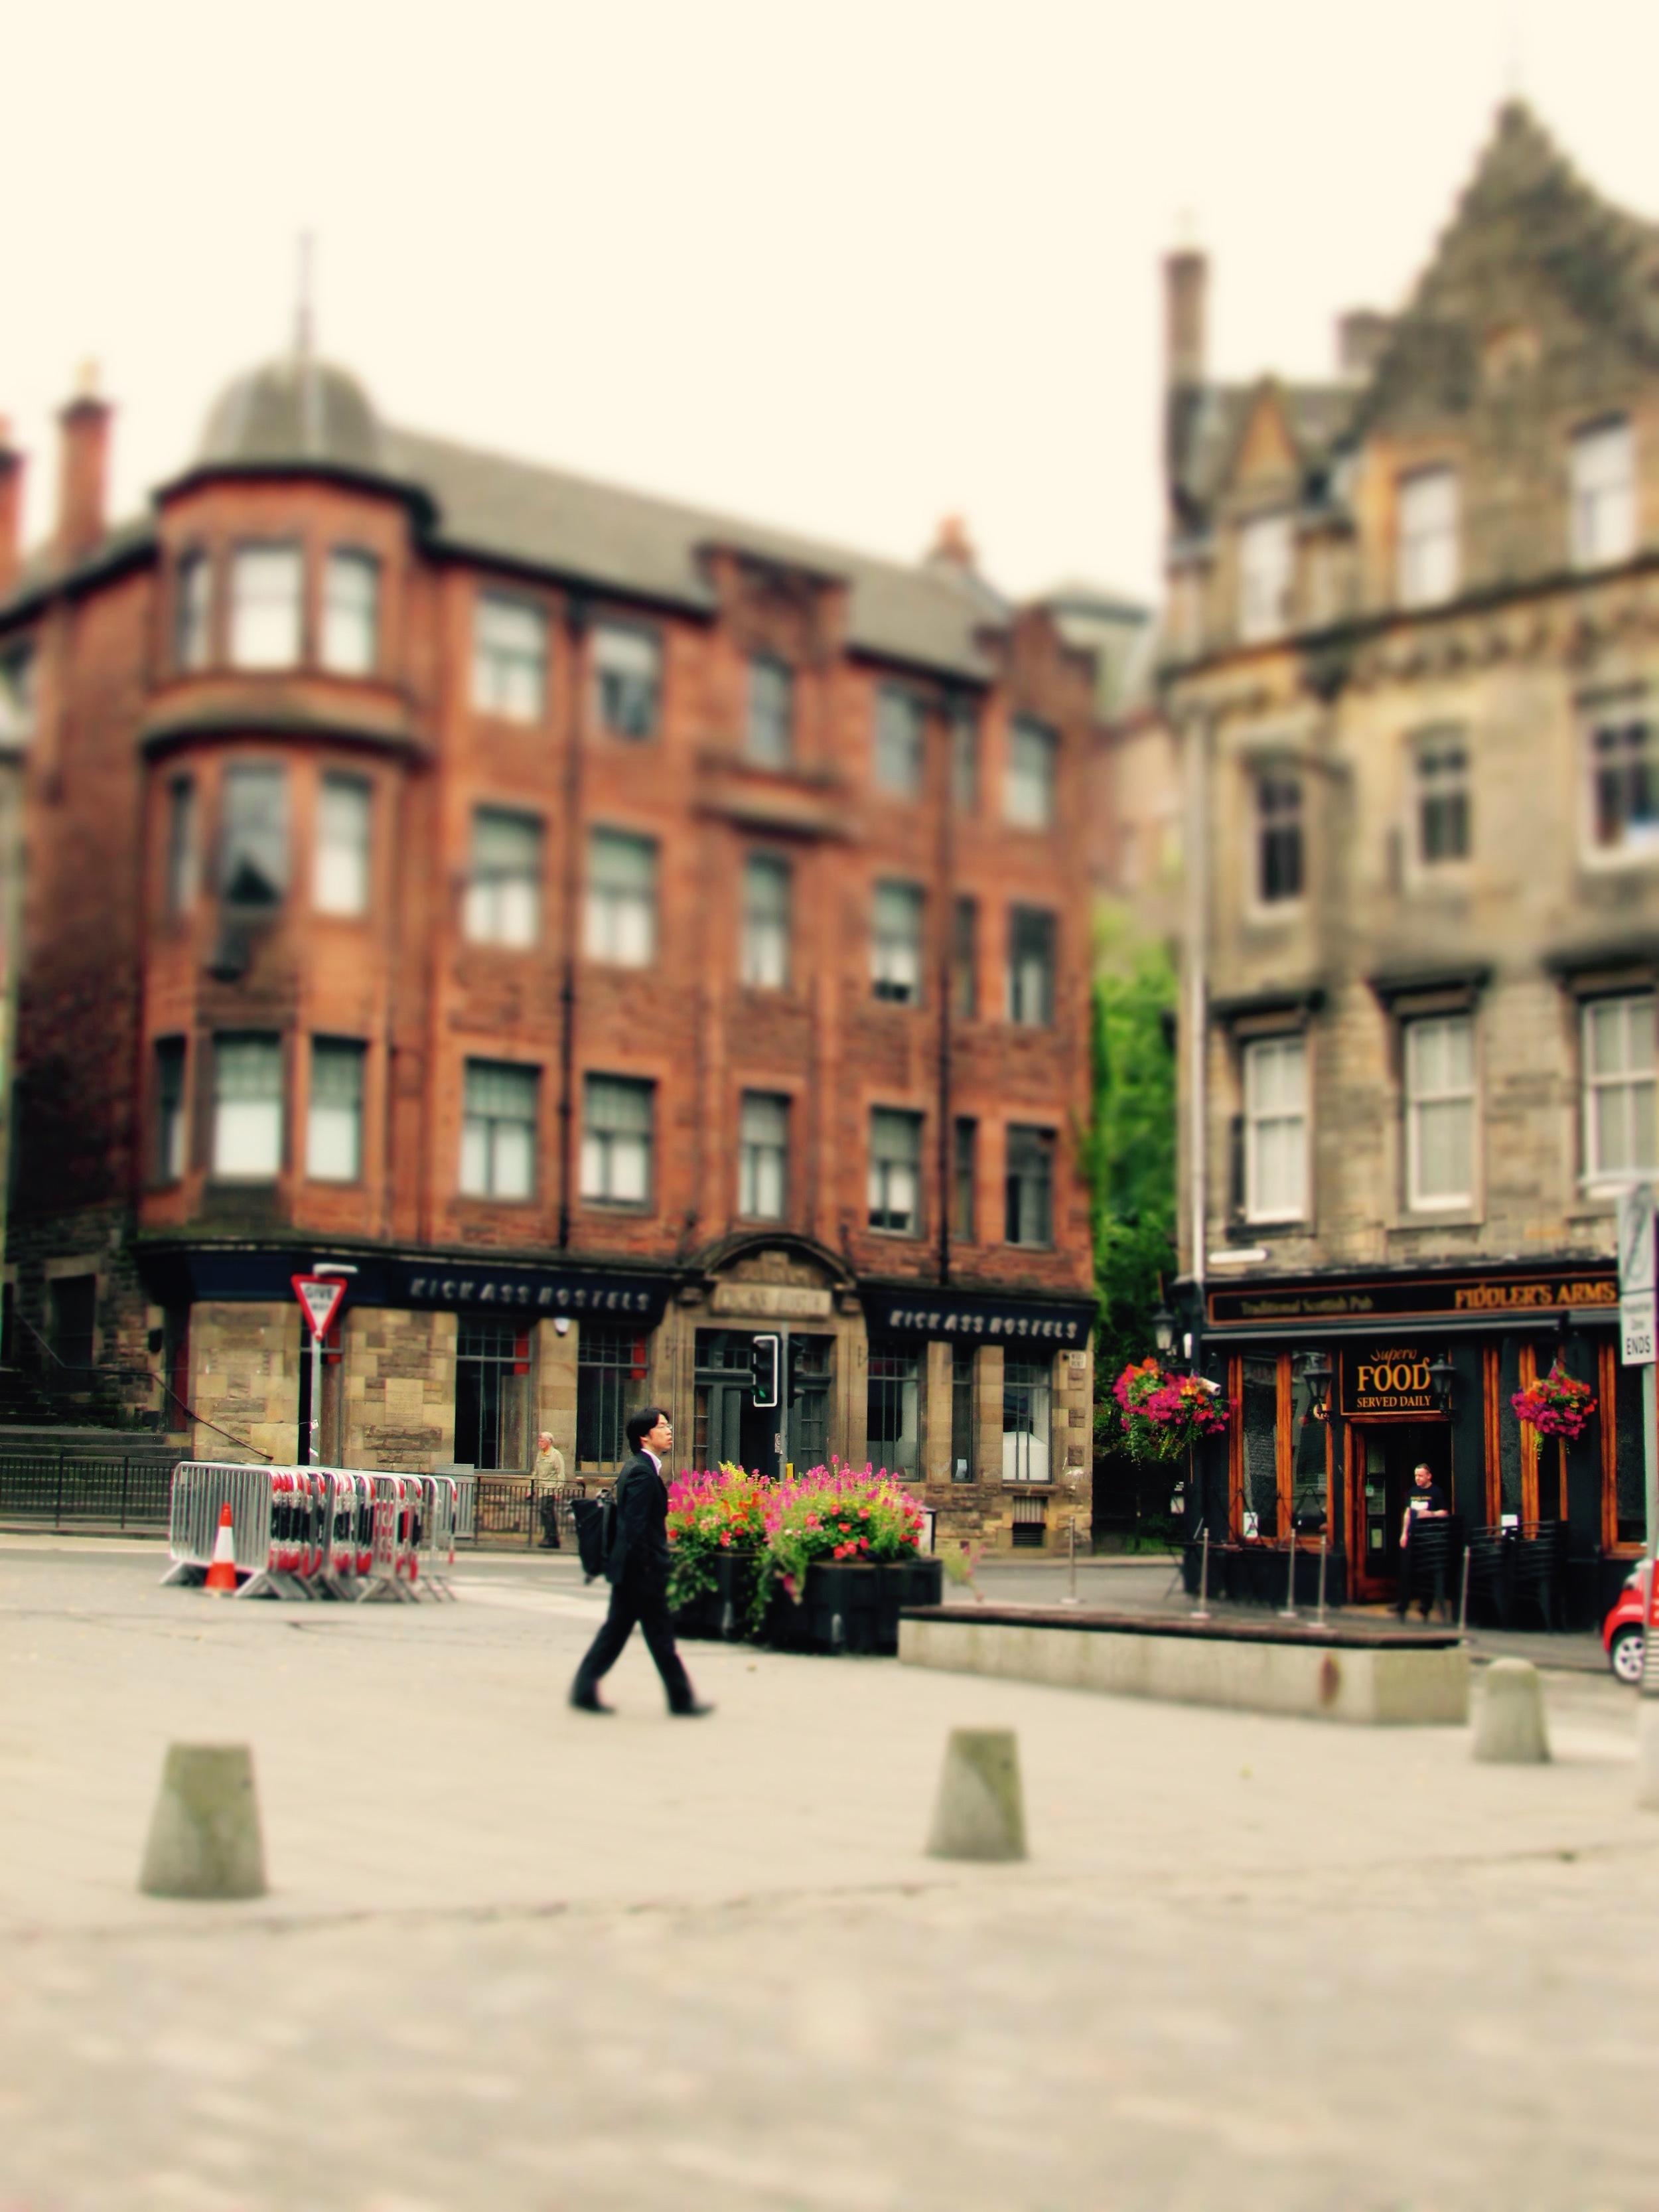 A quiet, cloudy morning in Edinburgh, Scotland